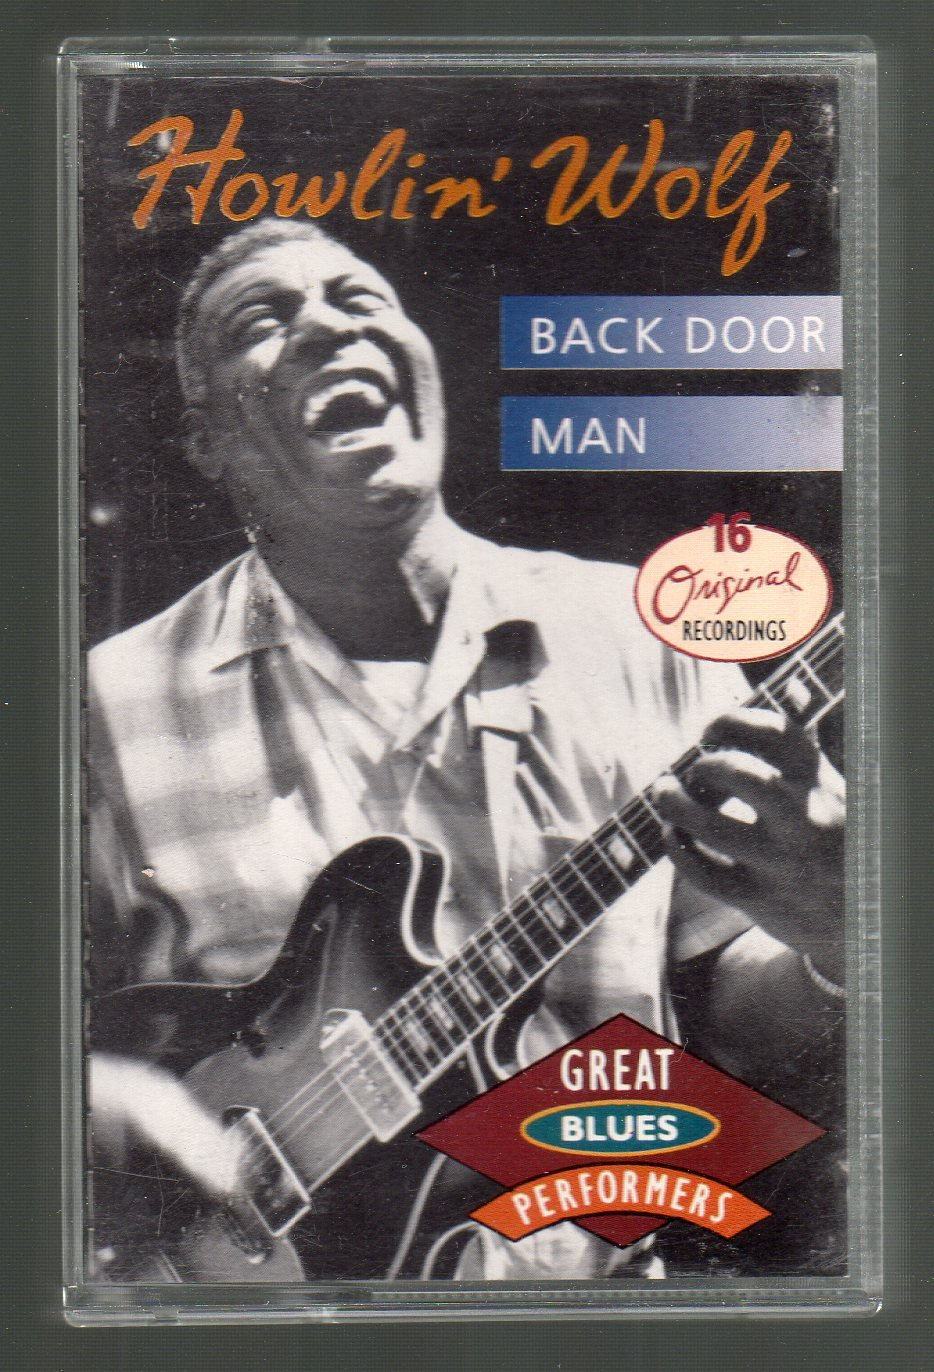 Howlin' Wolf - Back Door Man 16 Original Recordings SOLD RARE Cassette Tape